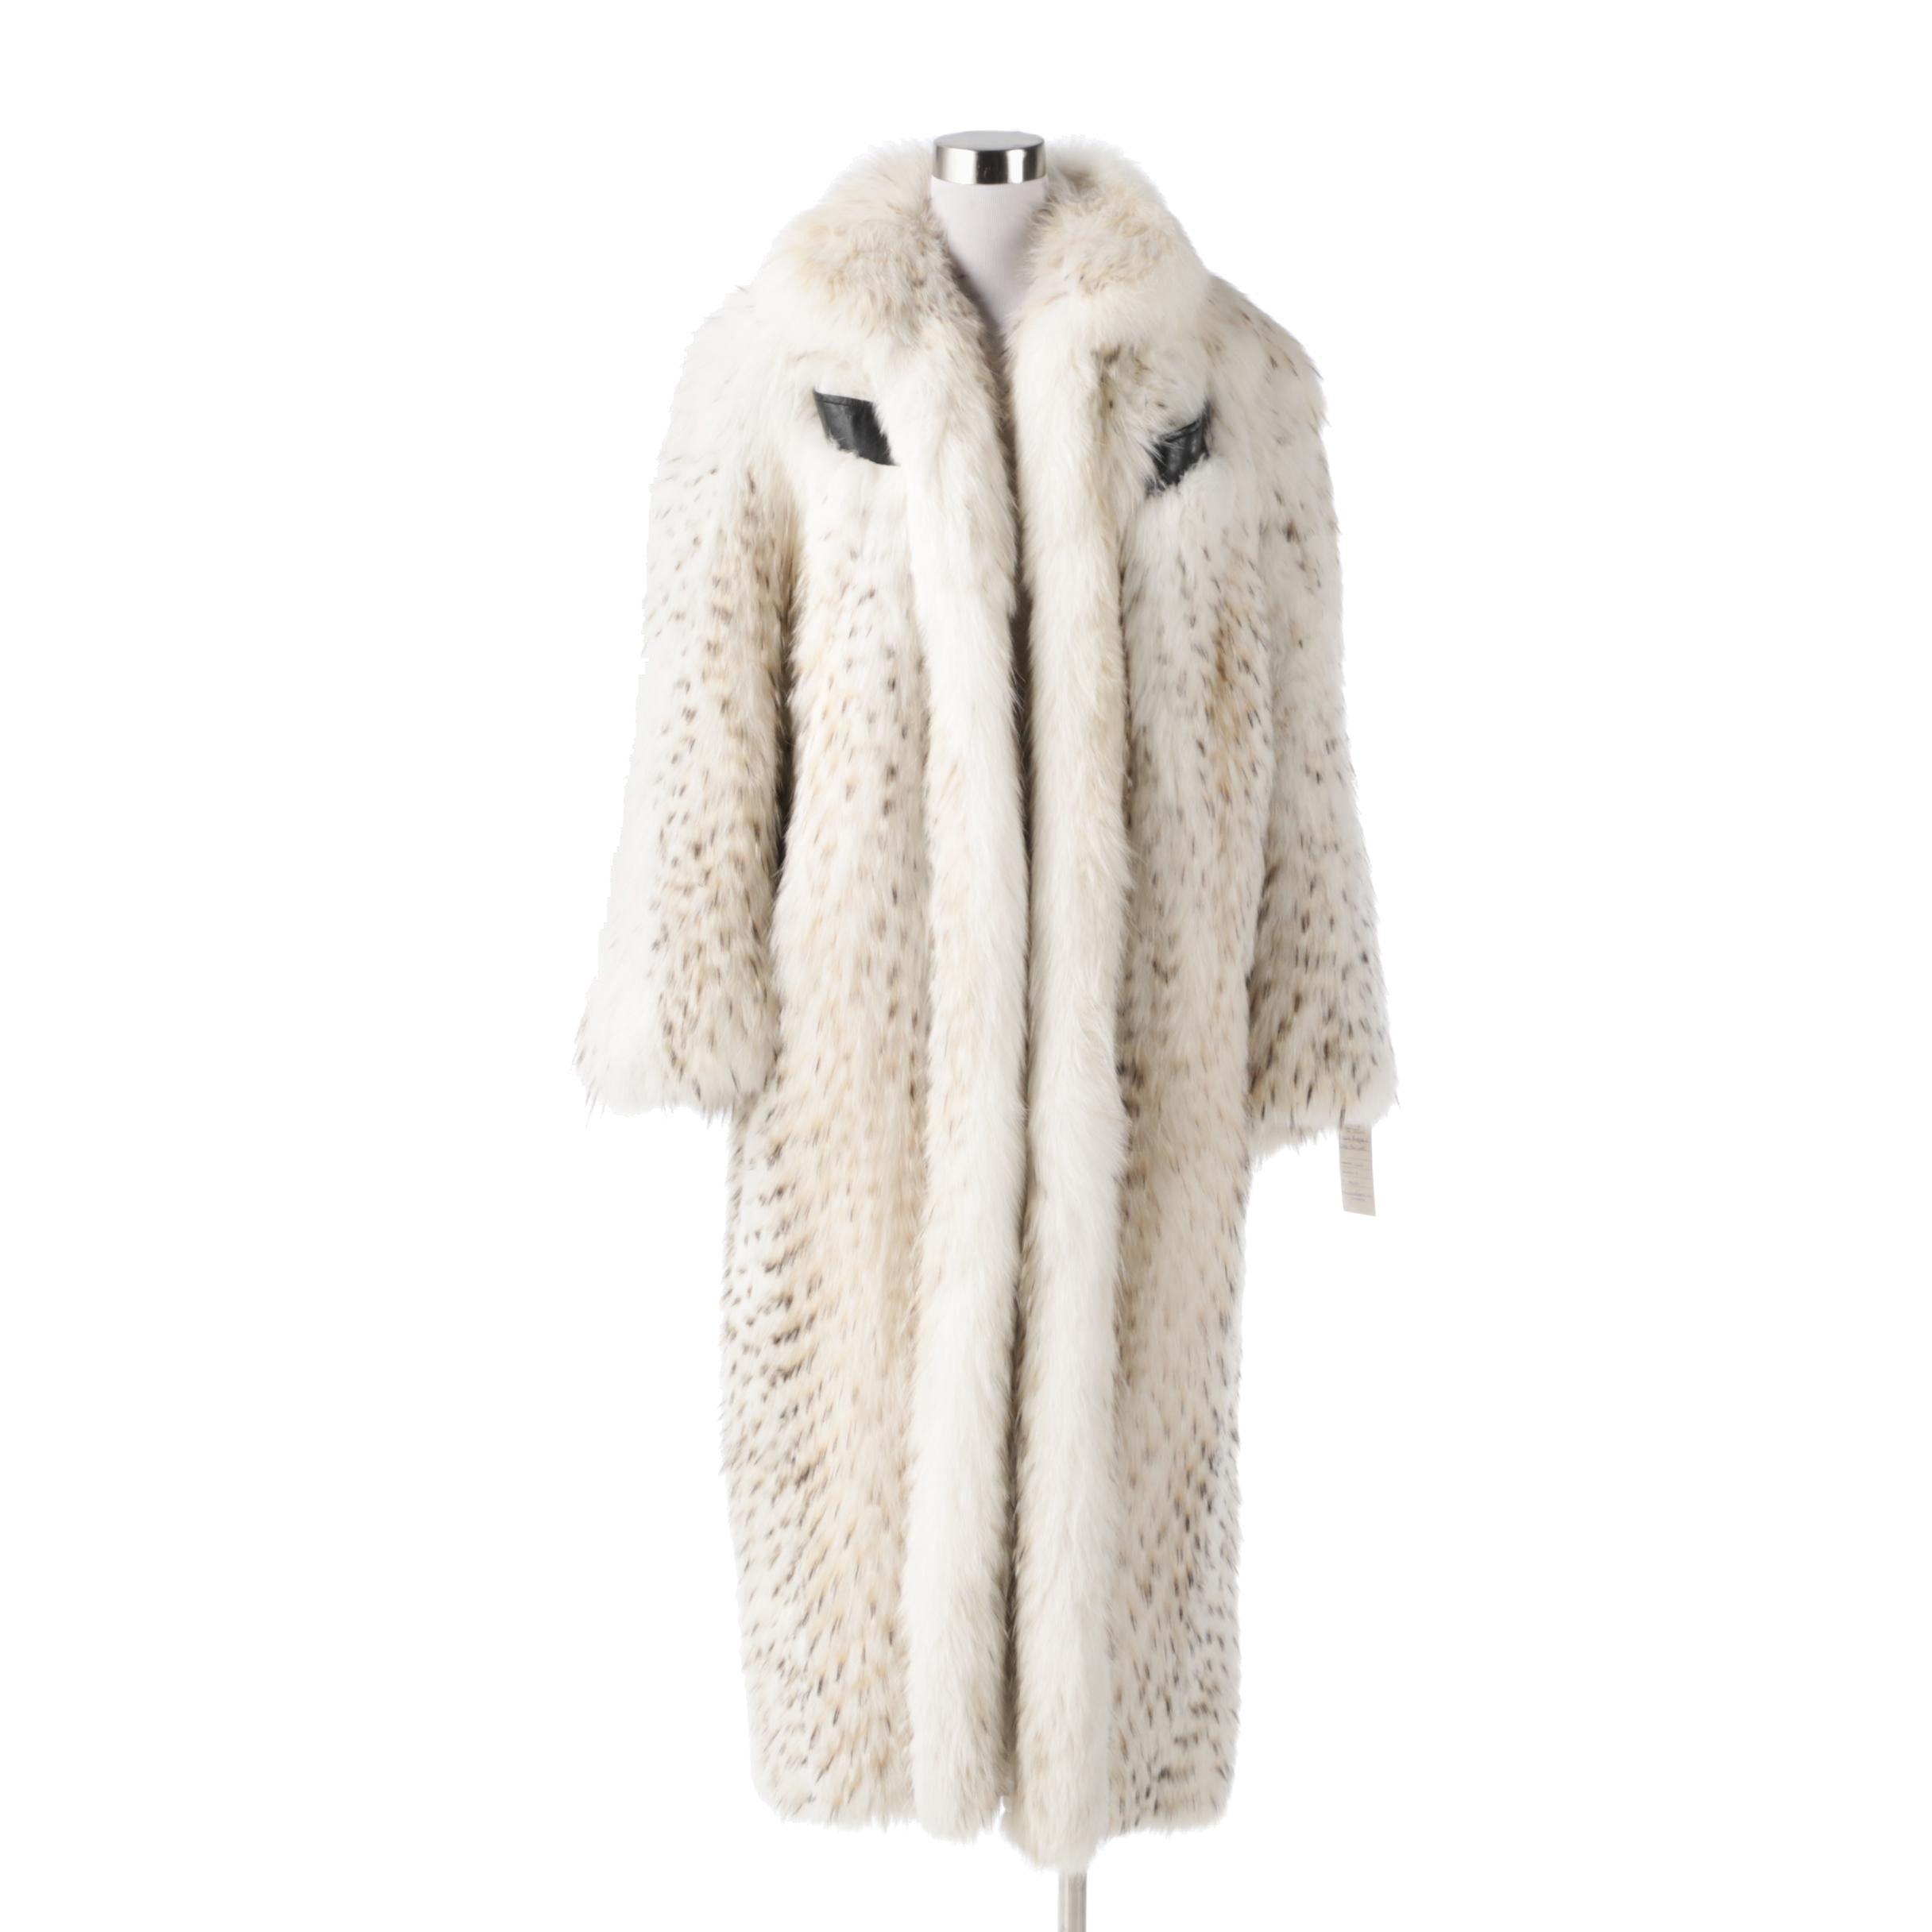 Women's Pieced Natural Badger Fur and Norwegian White Fox Fur Coat